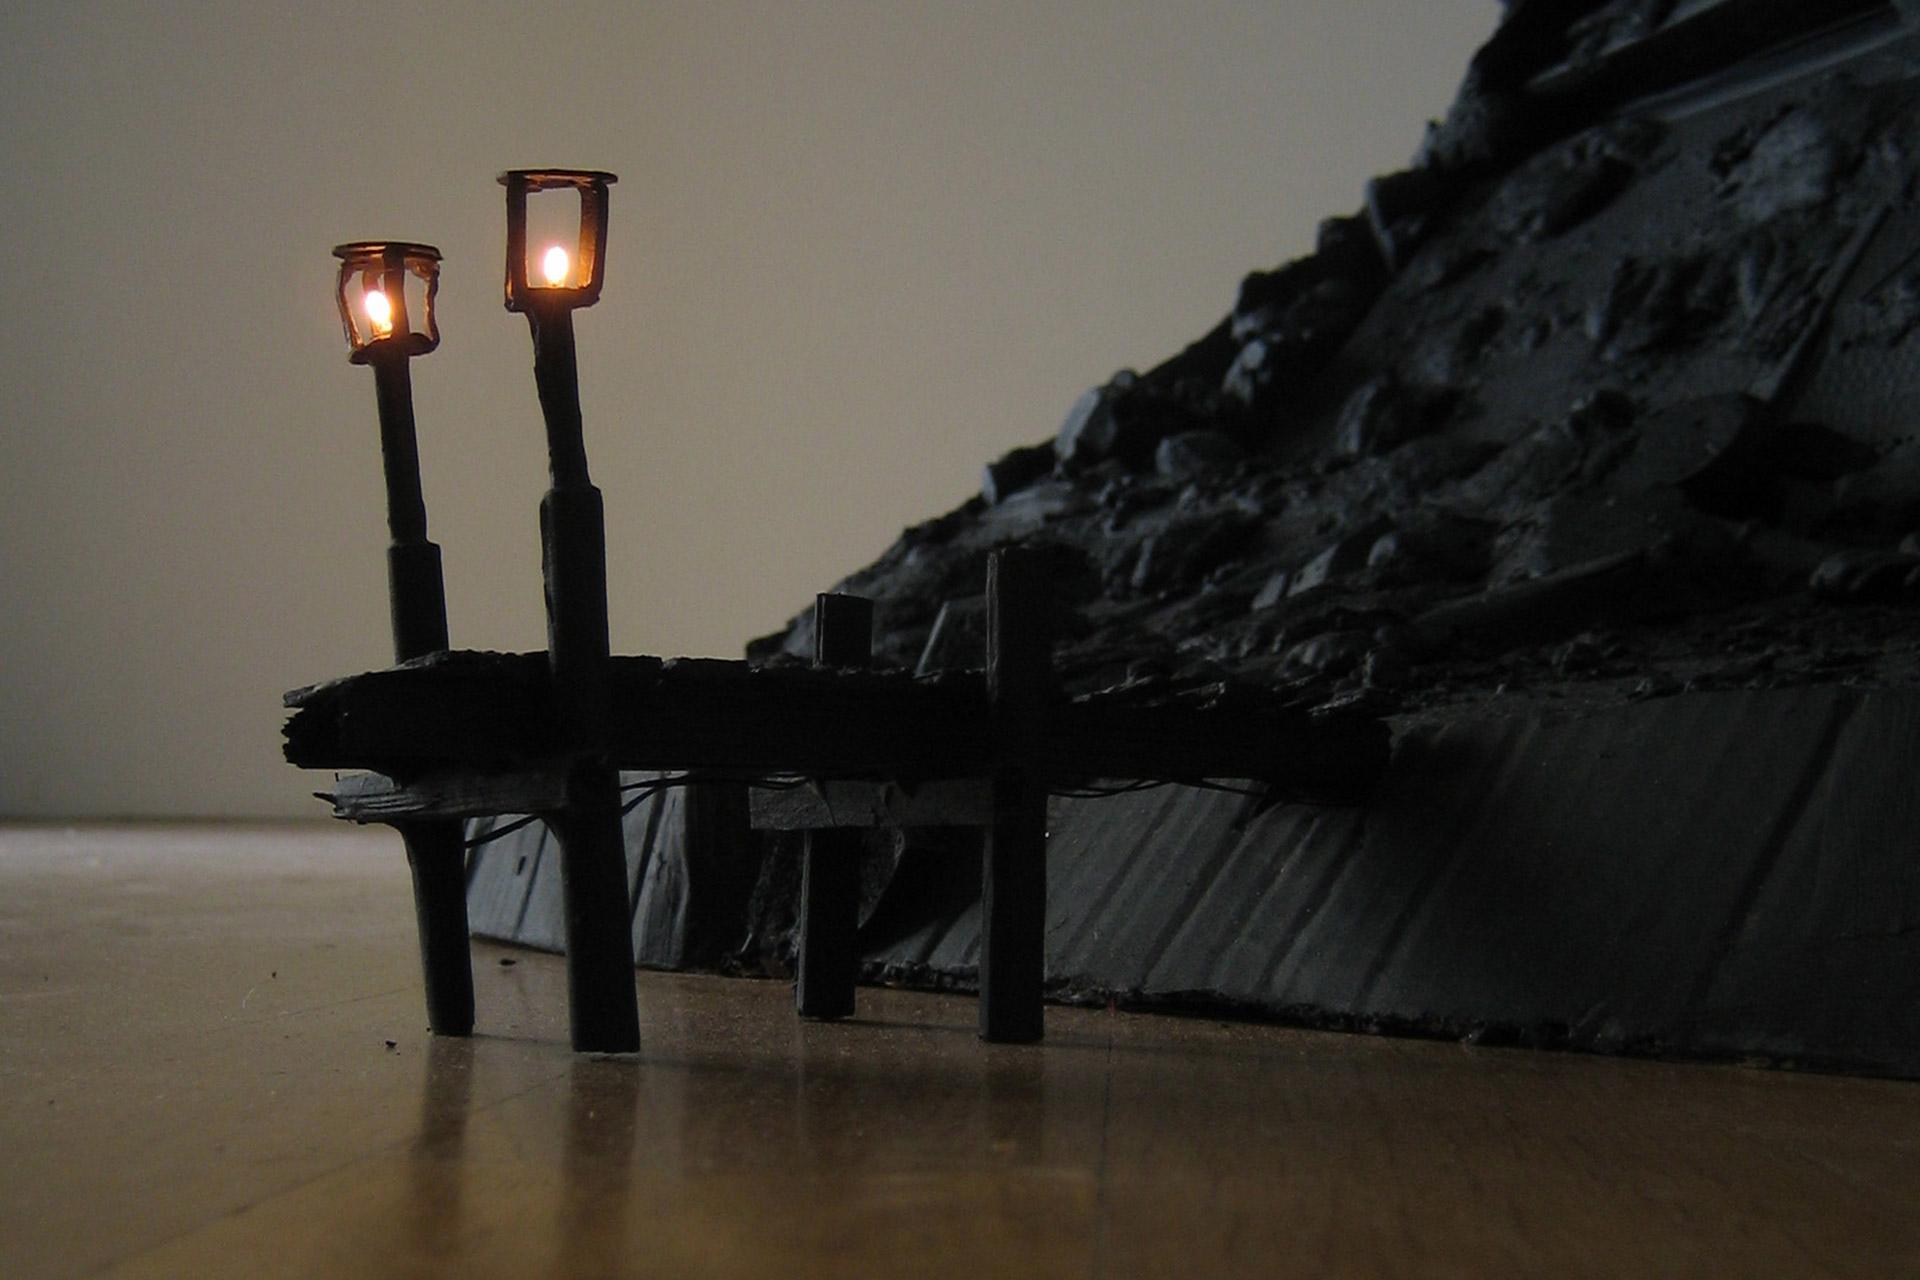 Temperli-Heim-Kunsthalle-Winterthur-2006.jpg